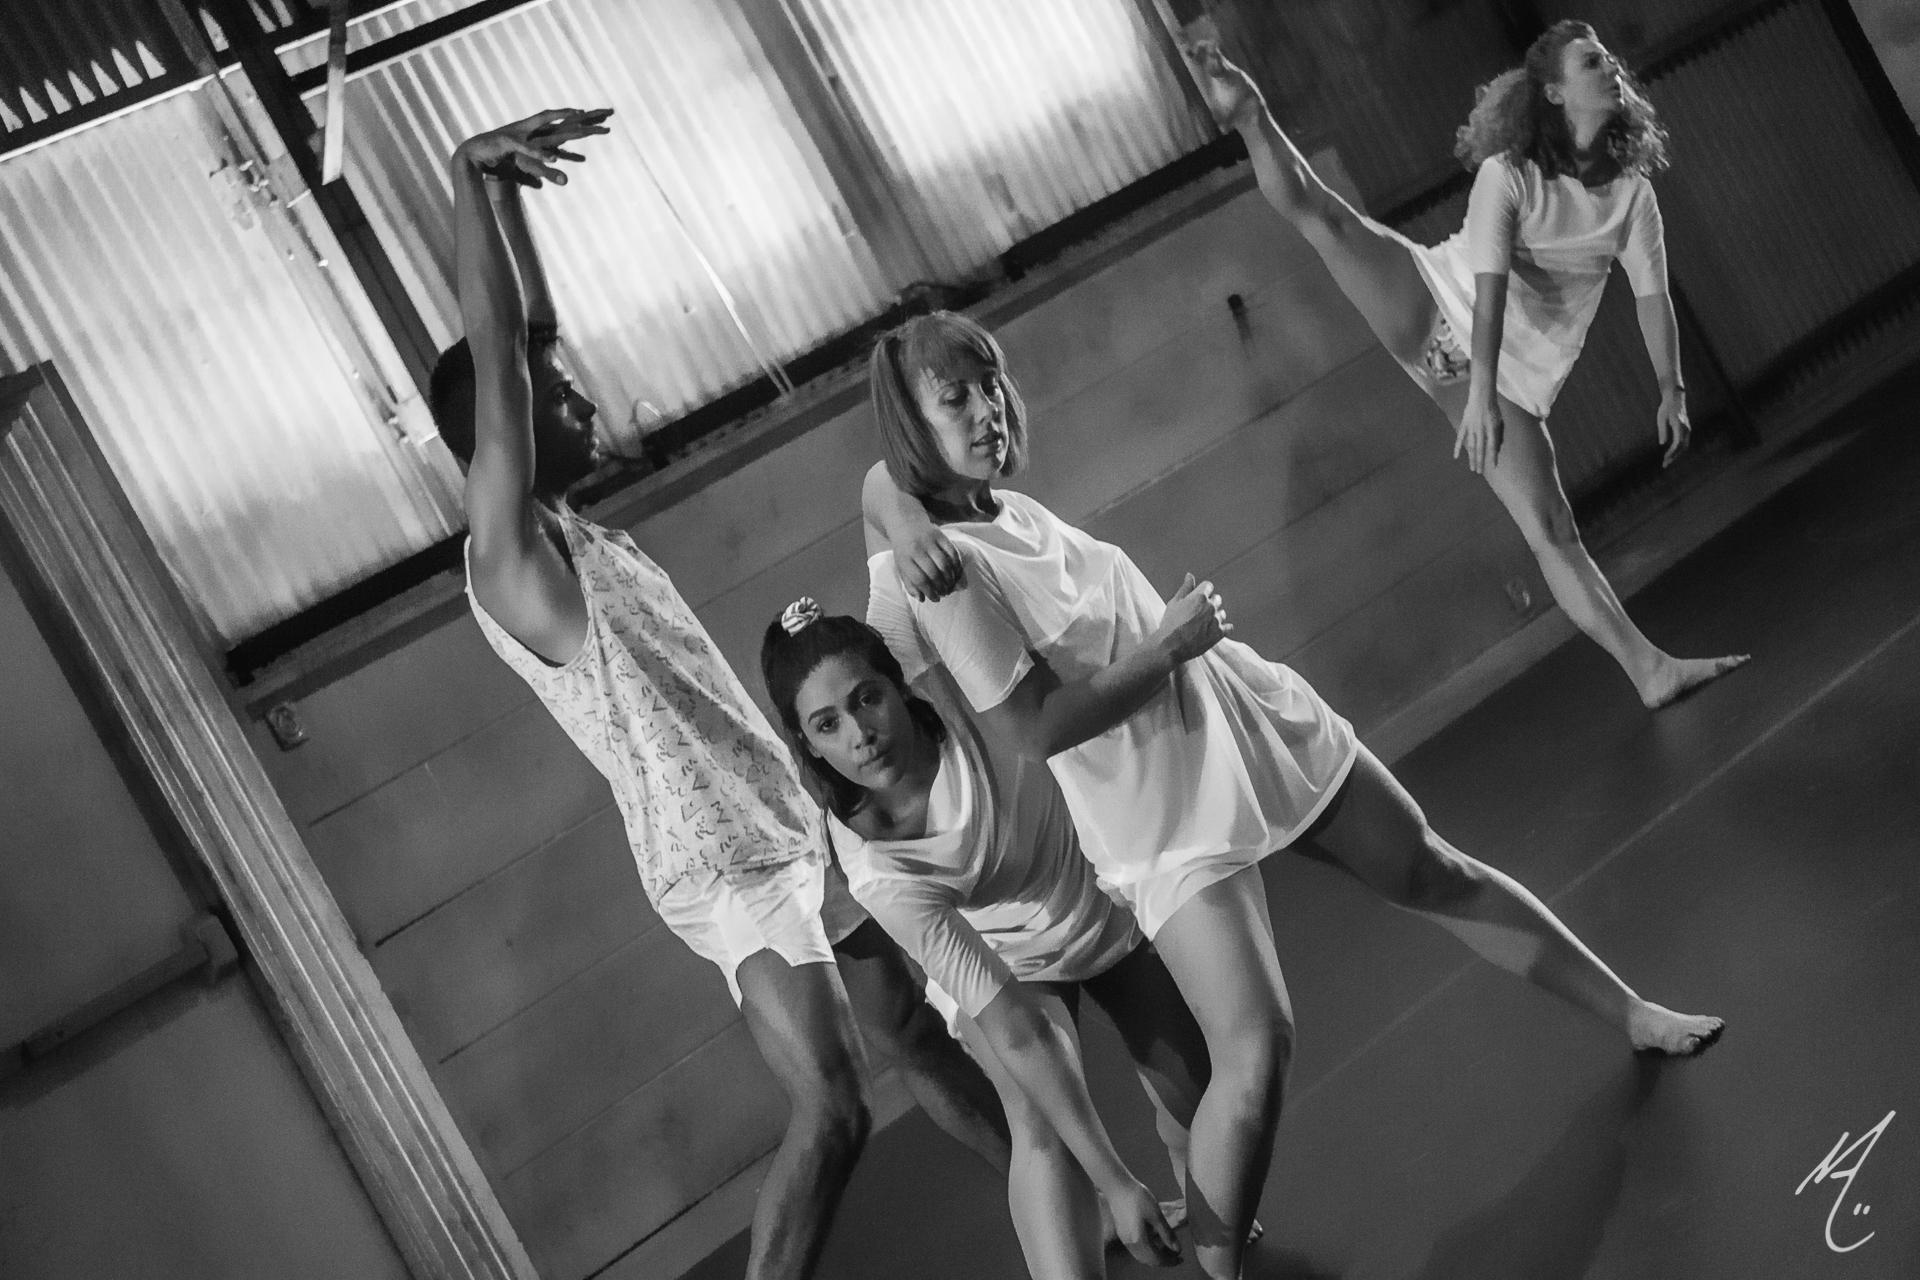 Dancers: Clay Moore, Lauren Parra, Emily Rushing, Hailley Laurèn